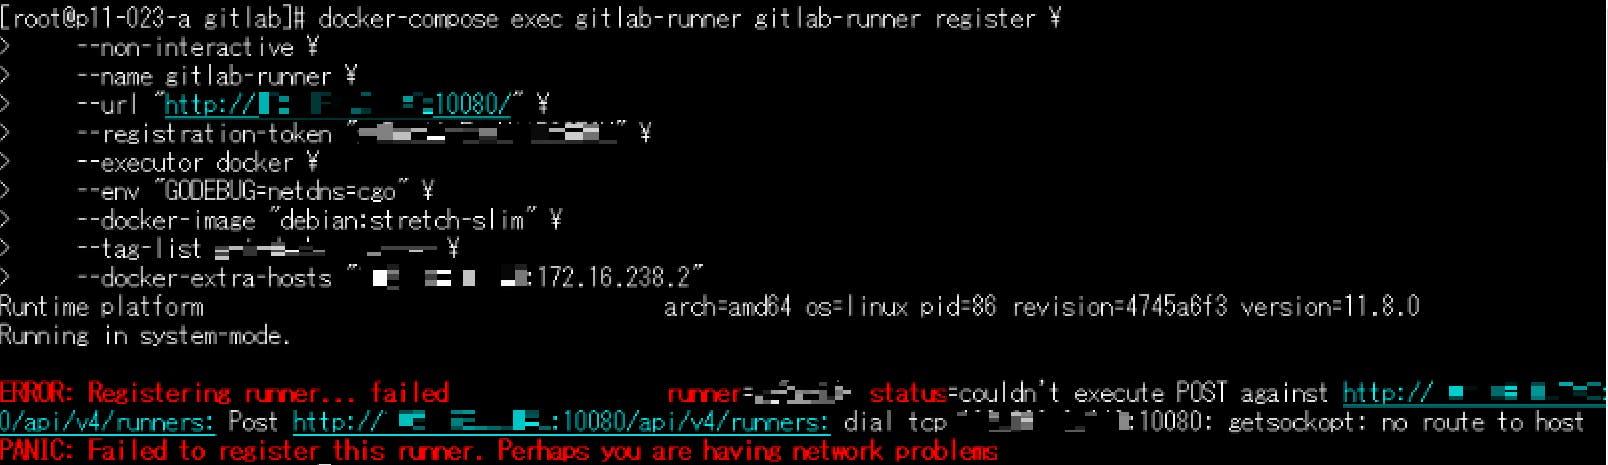 GitLab-CIでHerokuにデプロイするまでの奮闘記 - Qiita